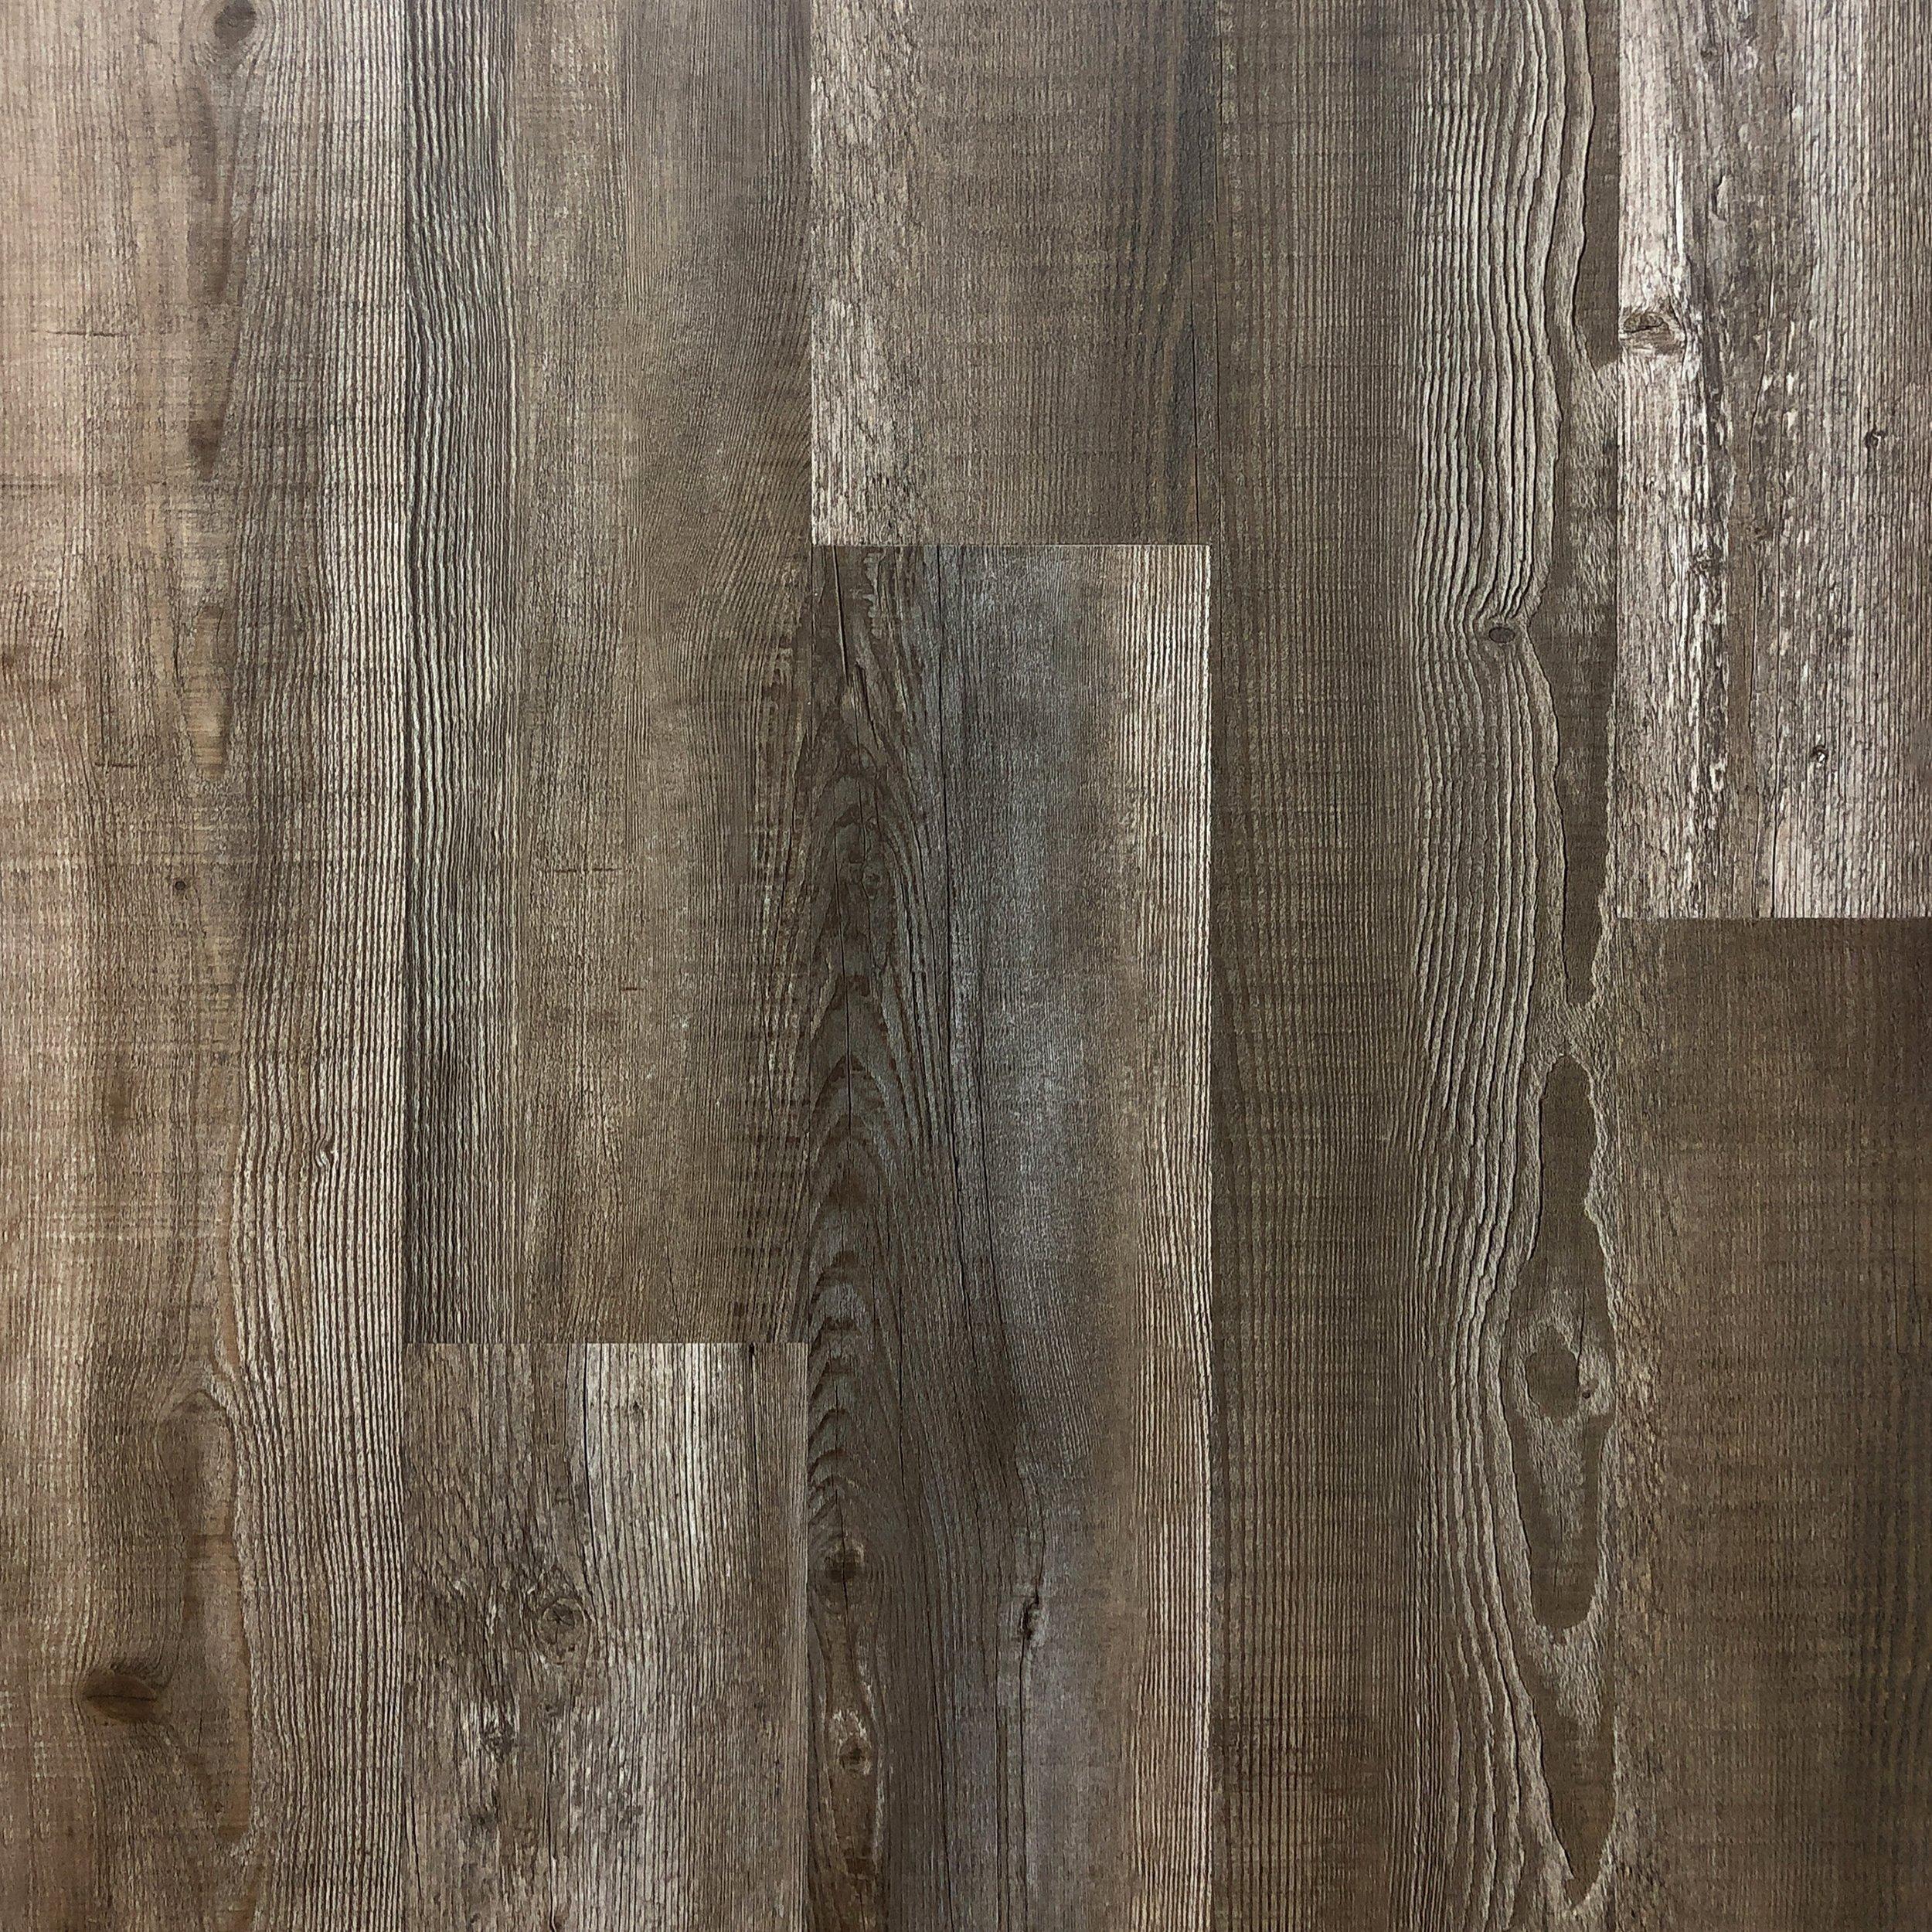 Beige Pine Luxury Vinyl Plank In 2020